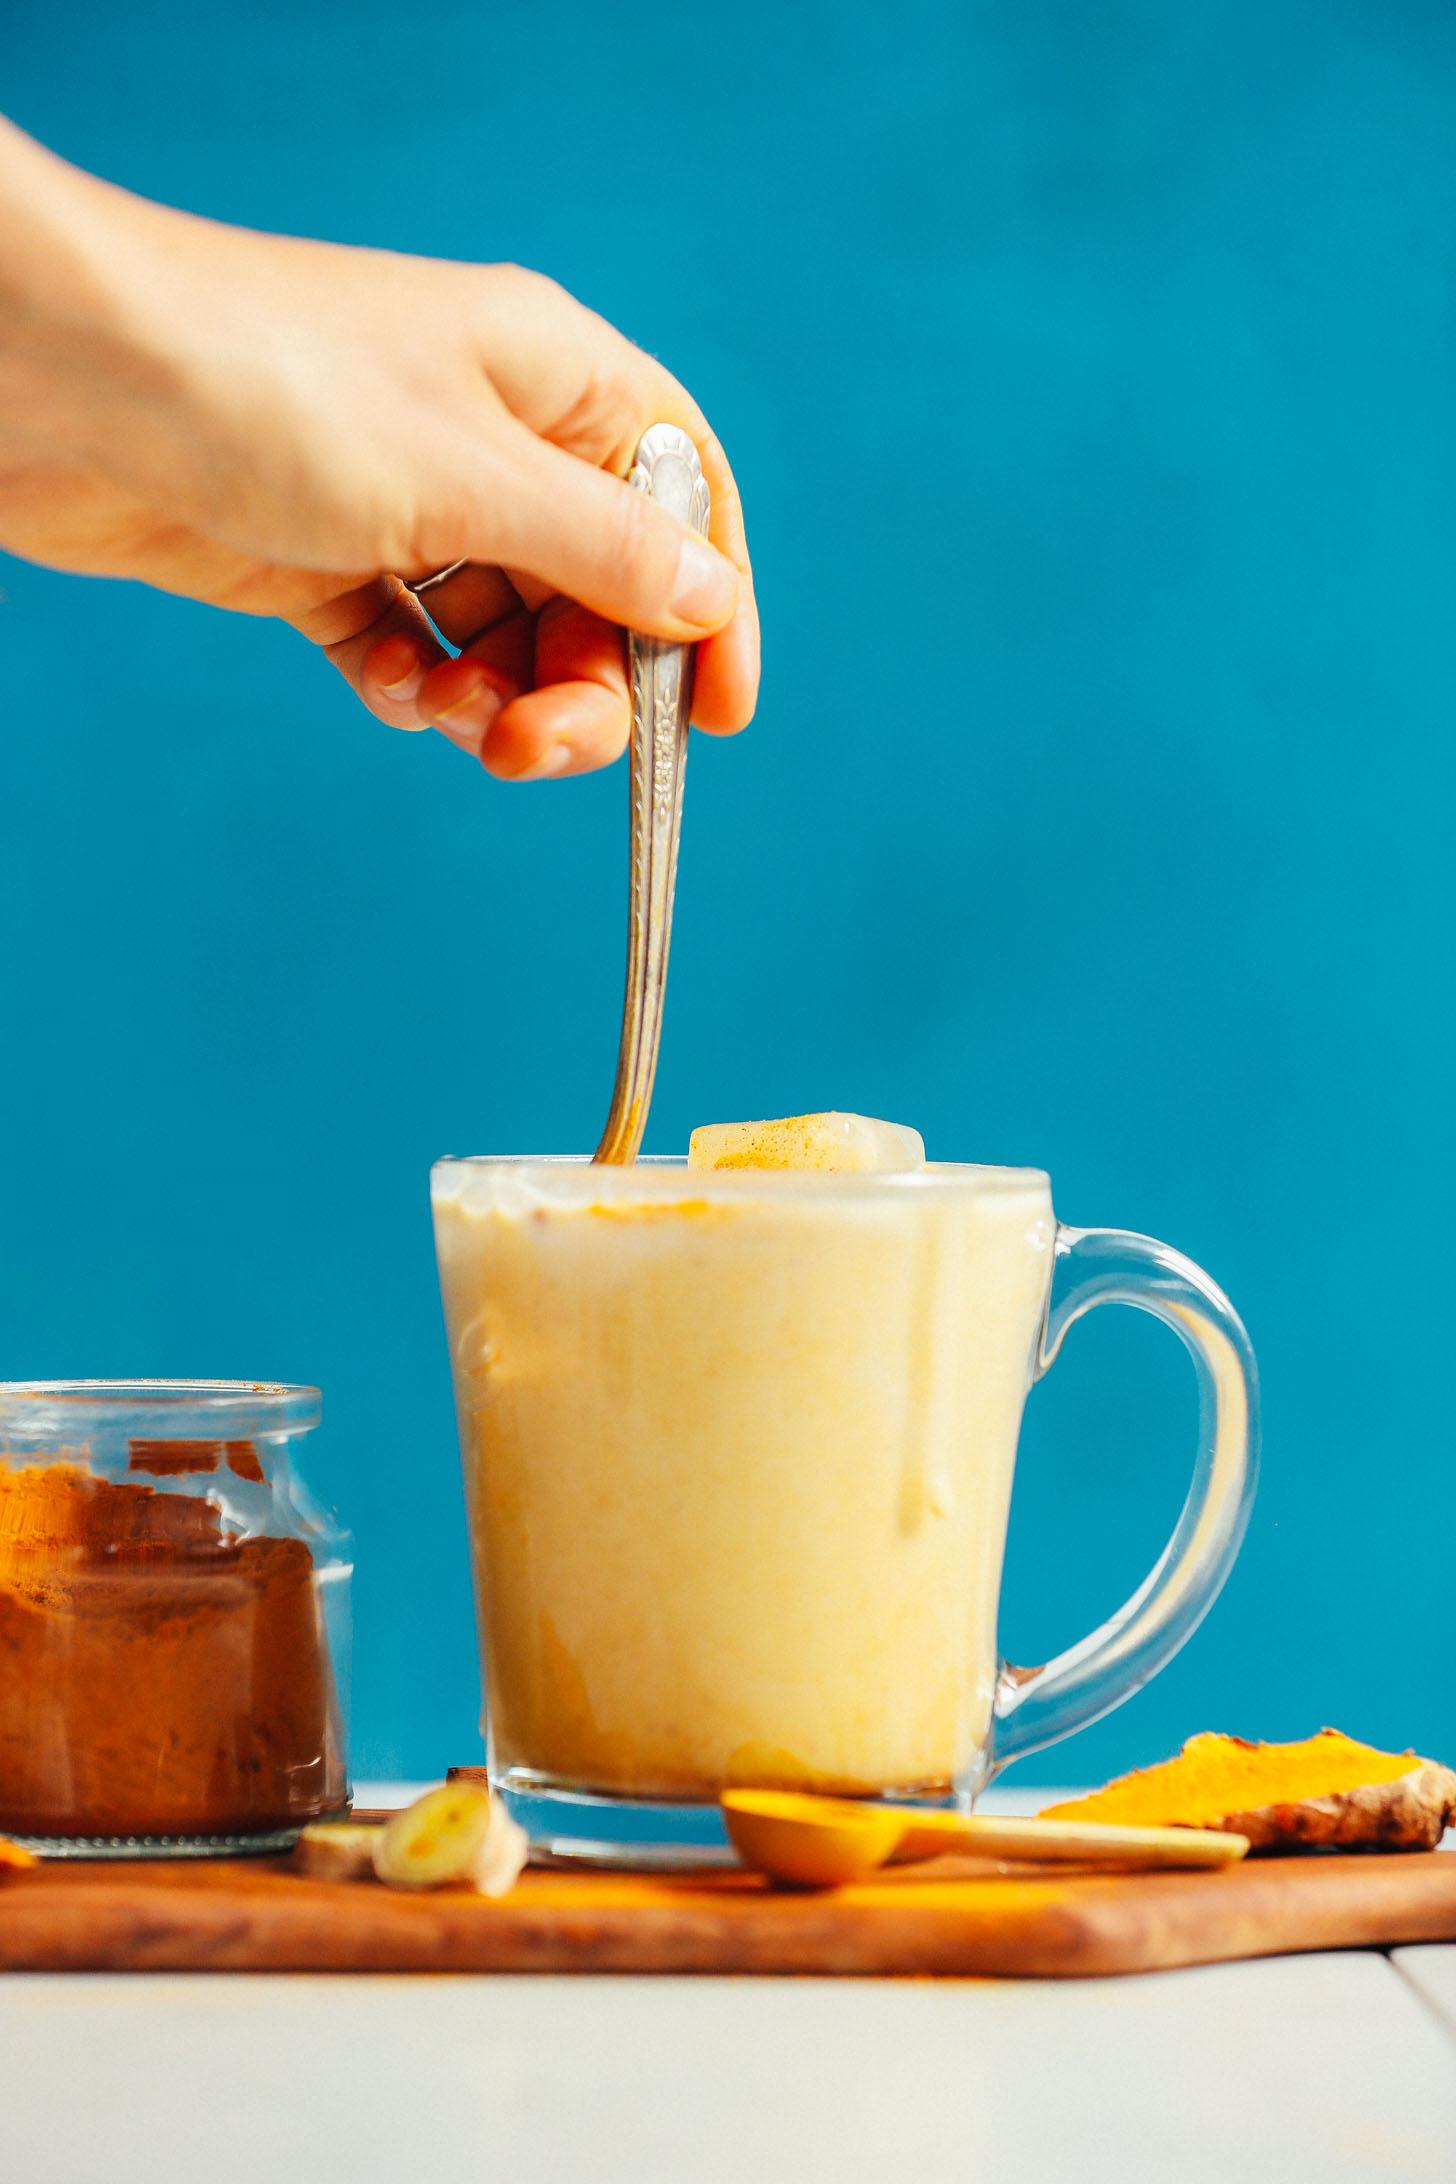 Stirring a glass mug of delicious vegan iced golden milk